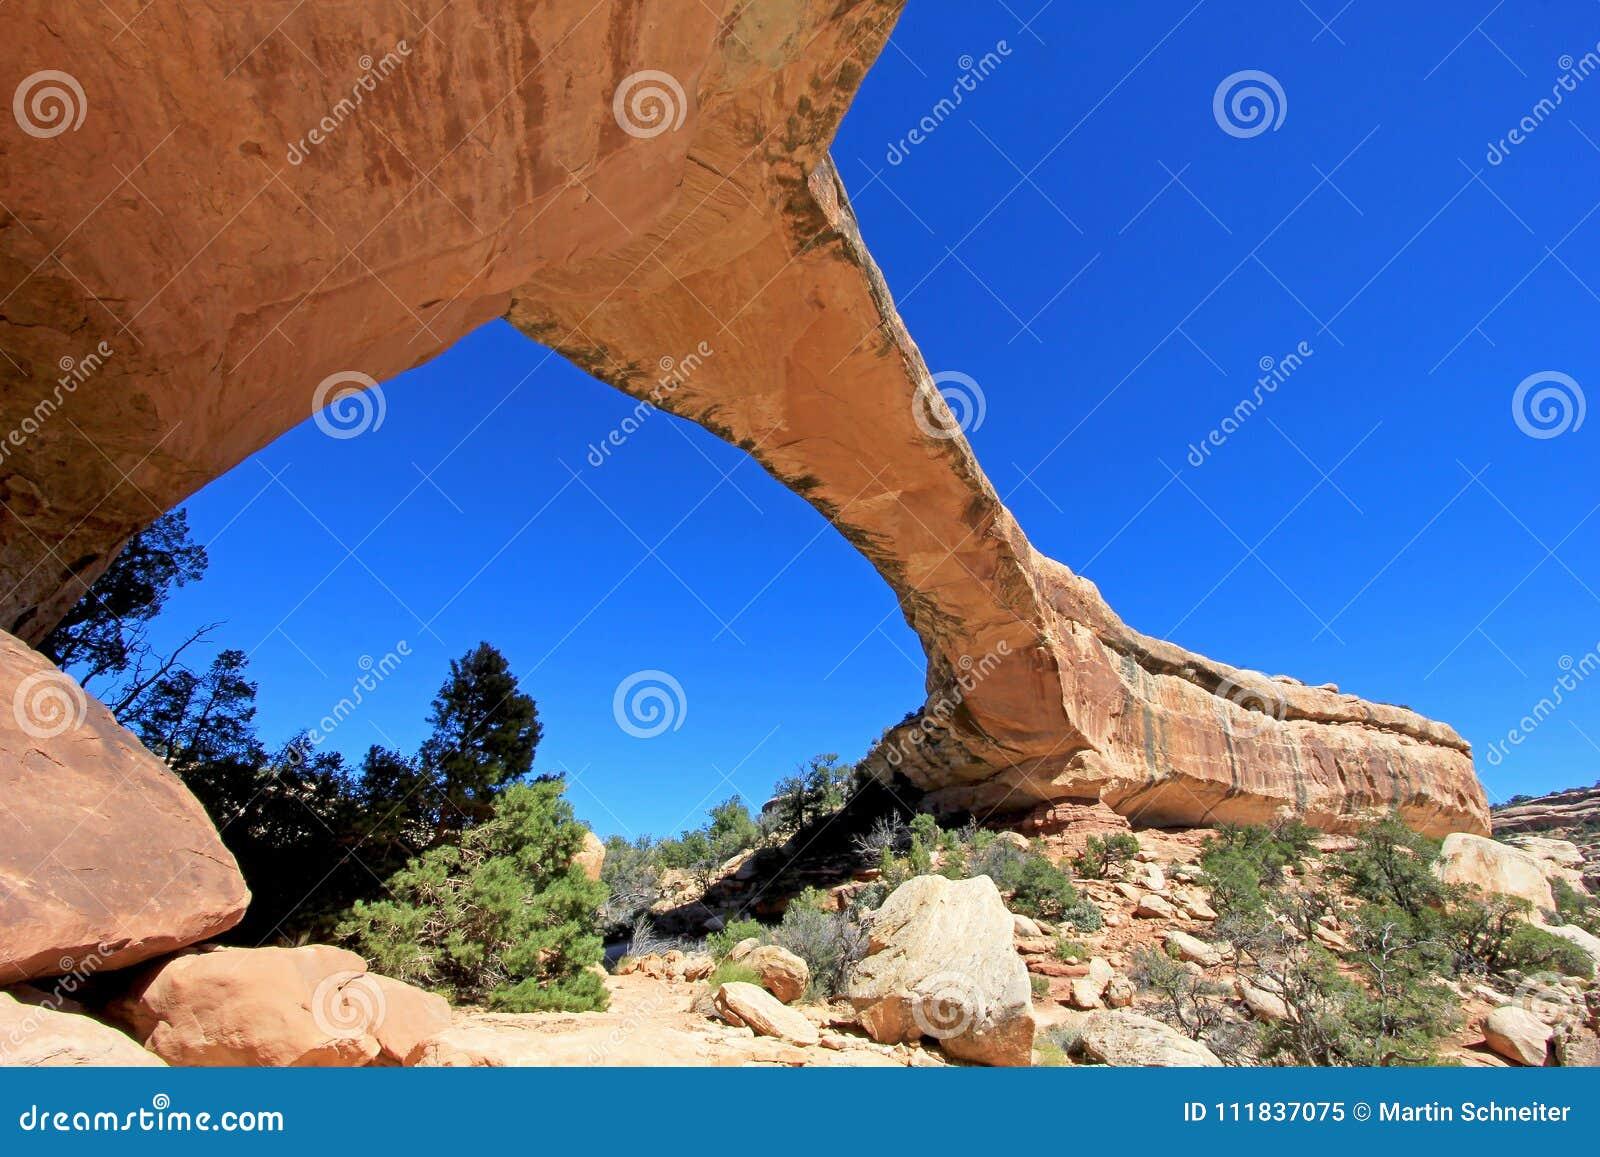 Owachomo bridge or arch in Natural Bridges National Monument, USA